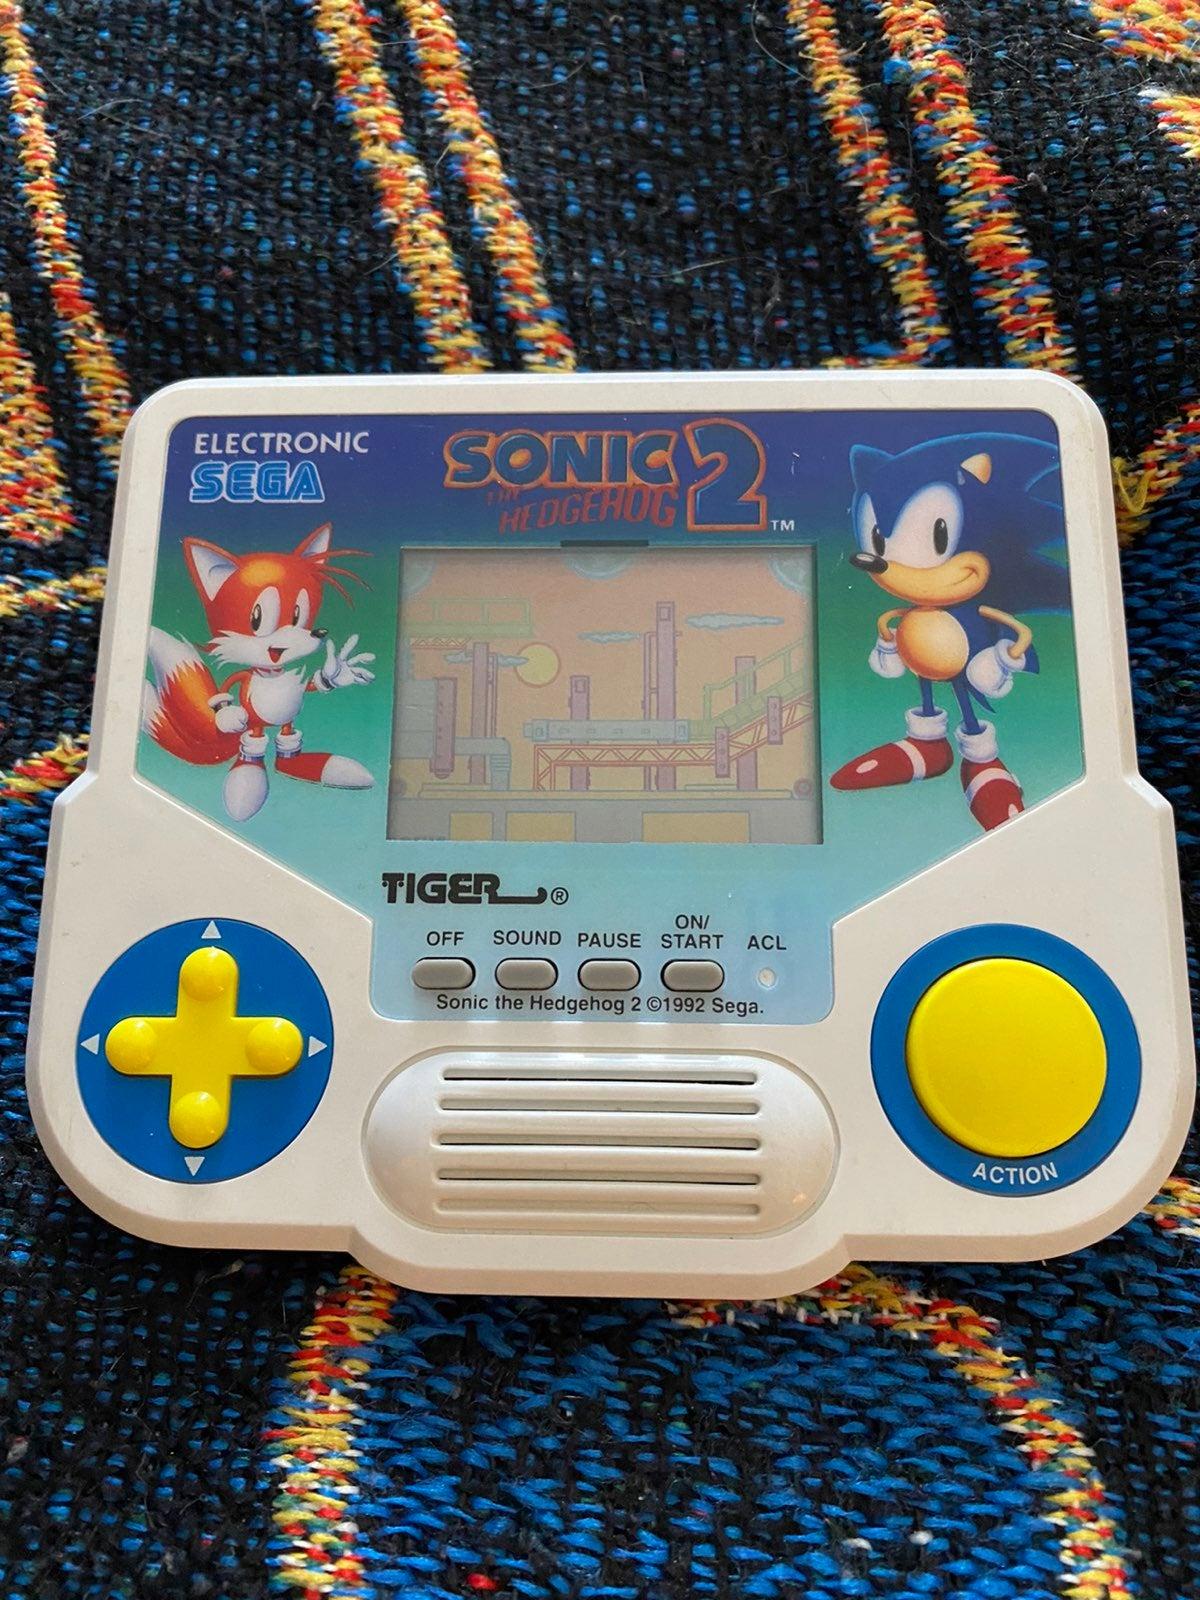 Sonic the Hedgehog 2 Tiger Handheld Game